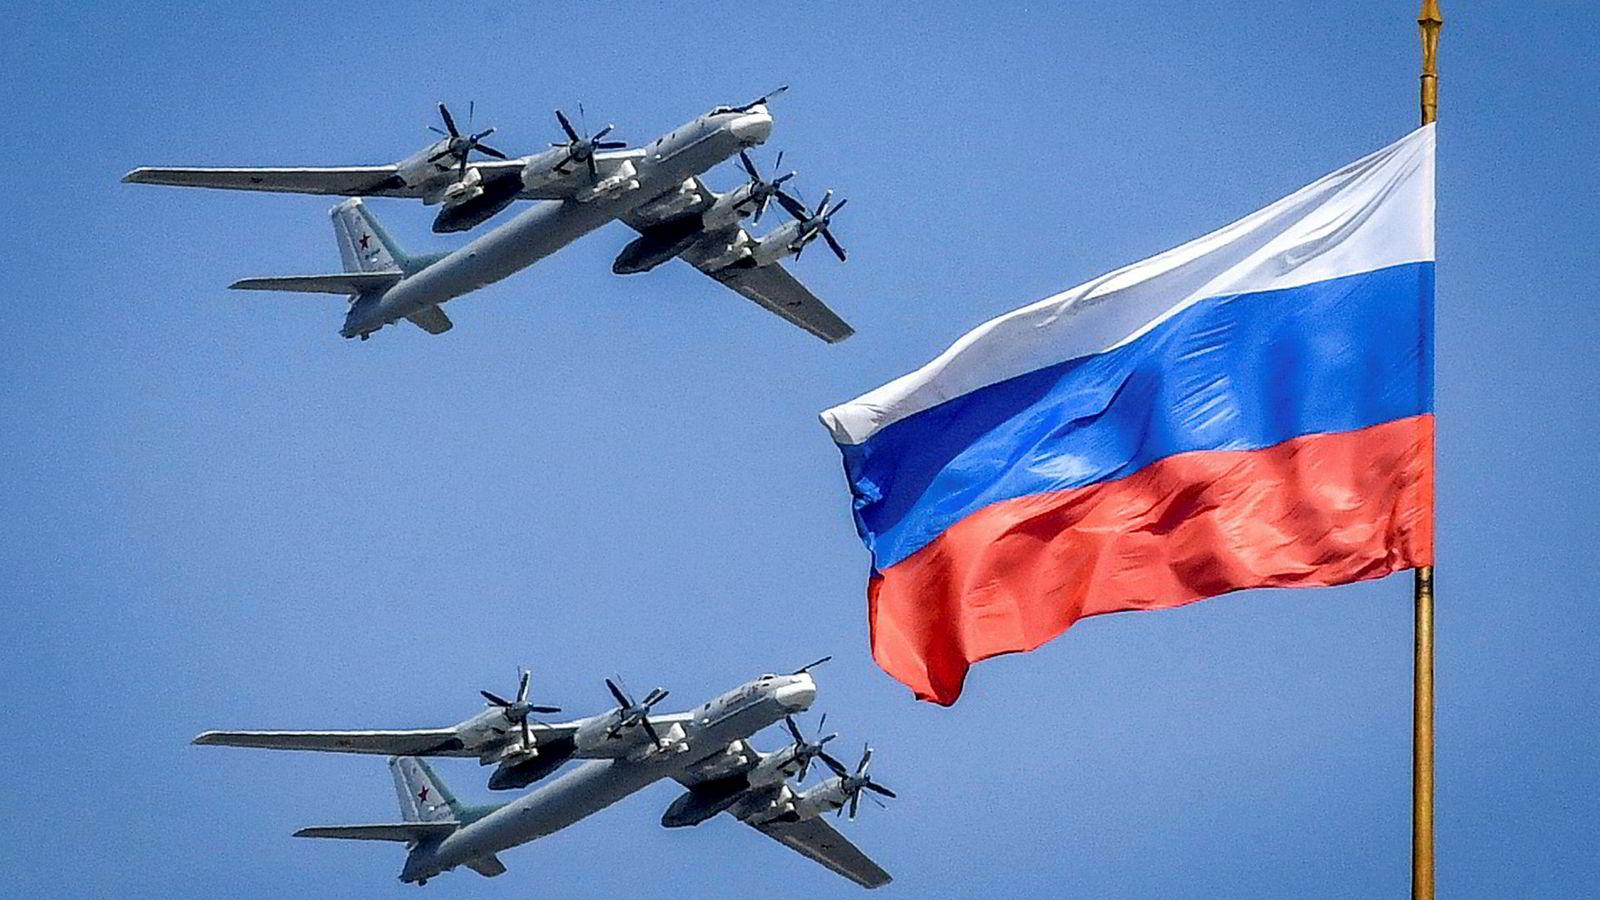 Fredag fikk Avinor beskjed om at to Tupolev Tu-95 bombefly (bildet) skulle fly rundt Norge.